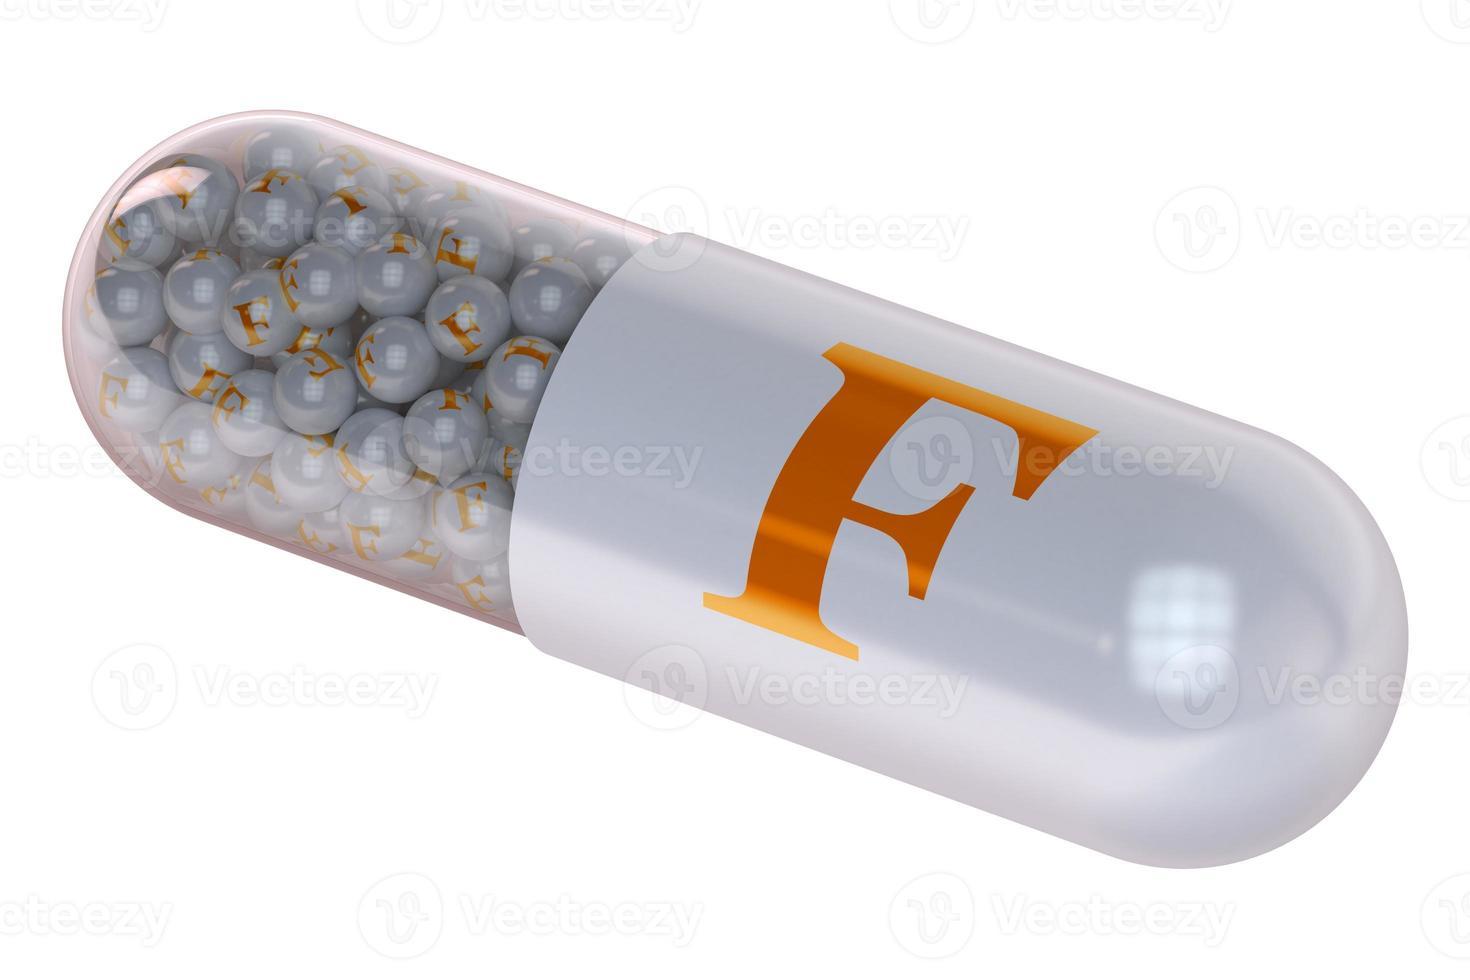 Vitaminkapsel f foto